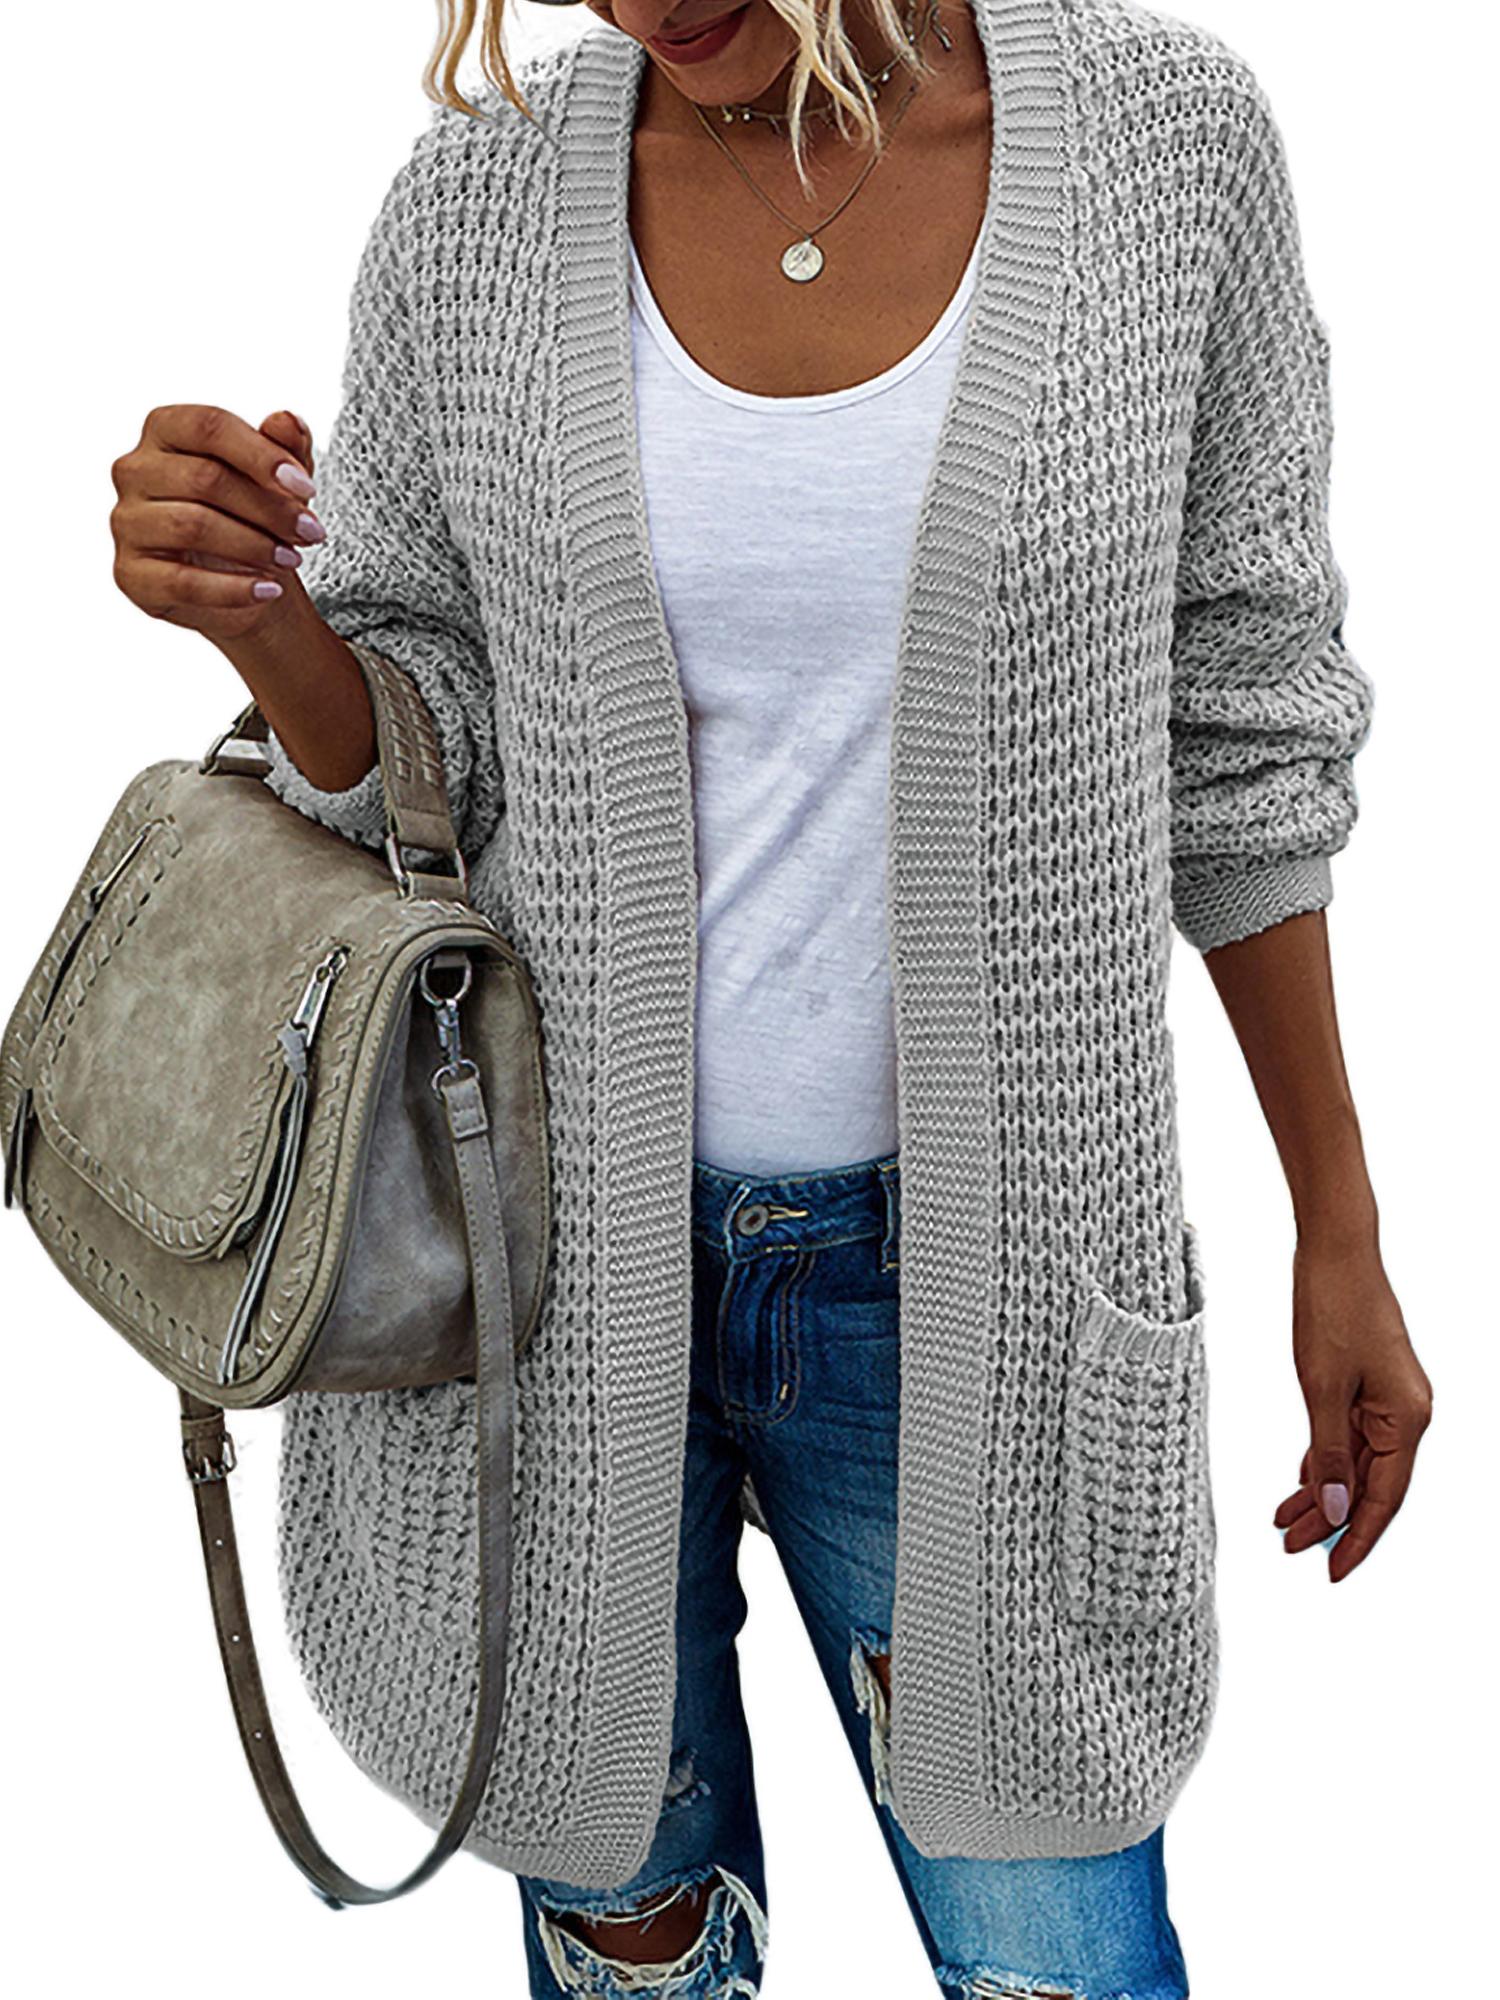 Women Winter Colorblock Open Front Cardigan Cable Knit Long Sleeve Outwear Coat